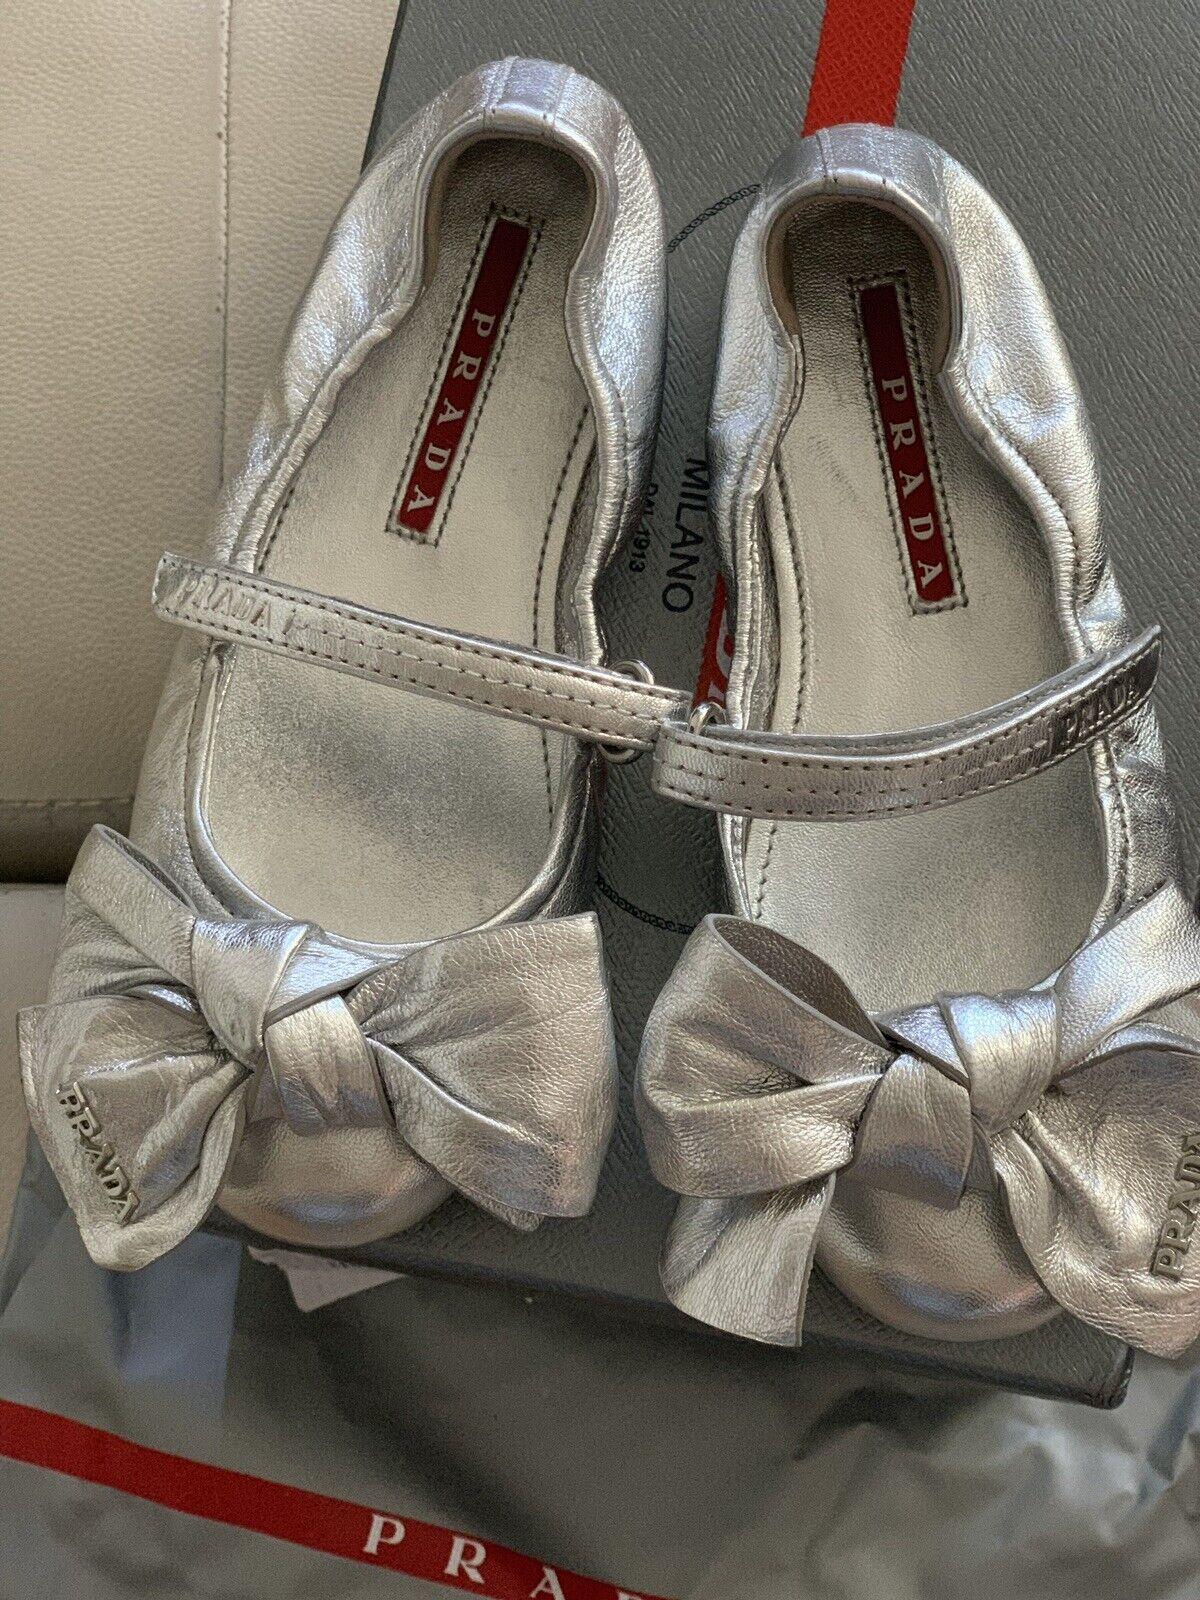 Prada Shoes Kids Flats Size 28 for sale